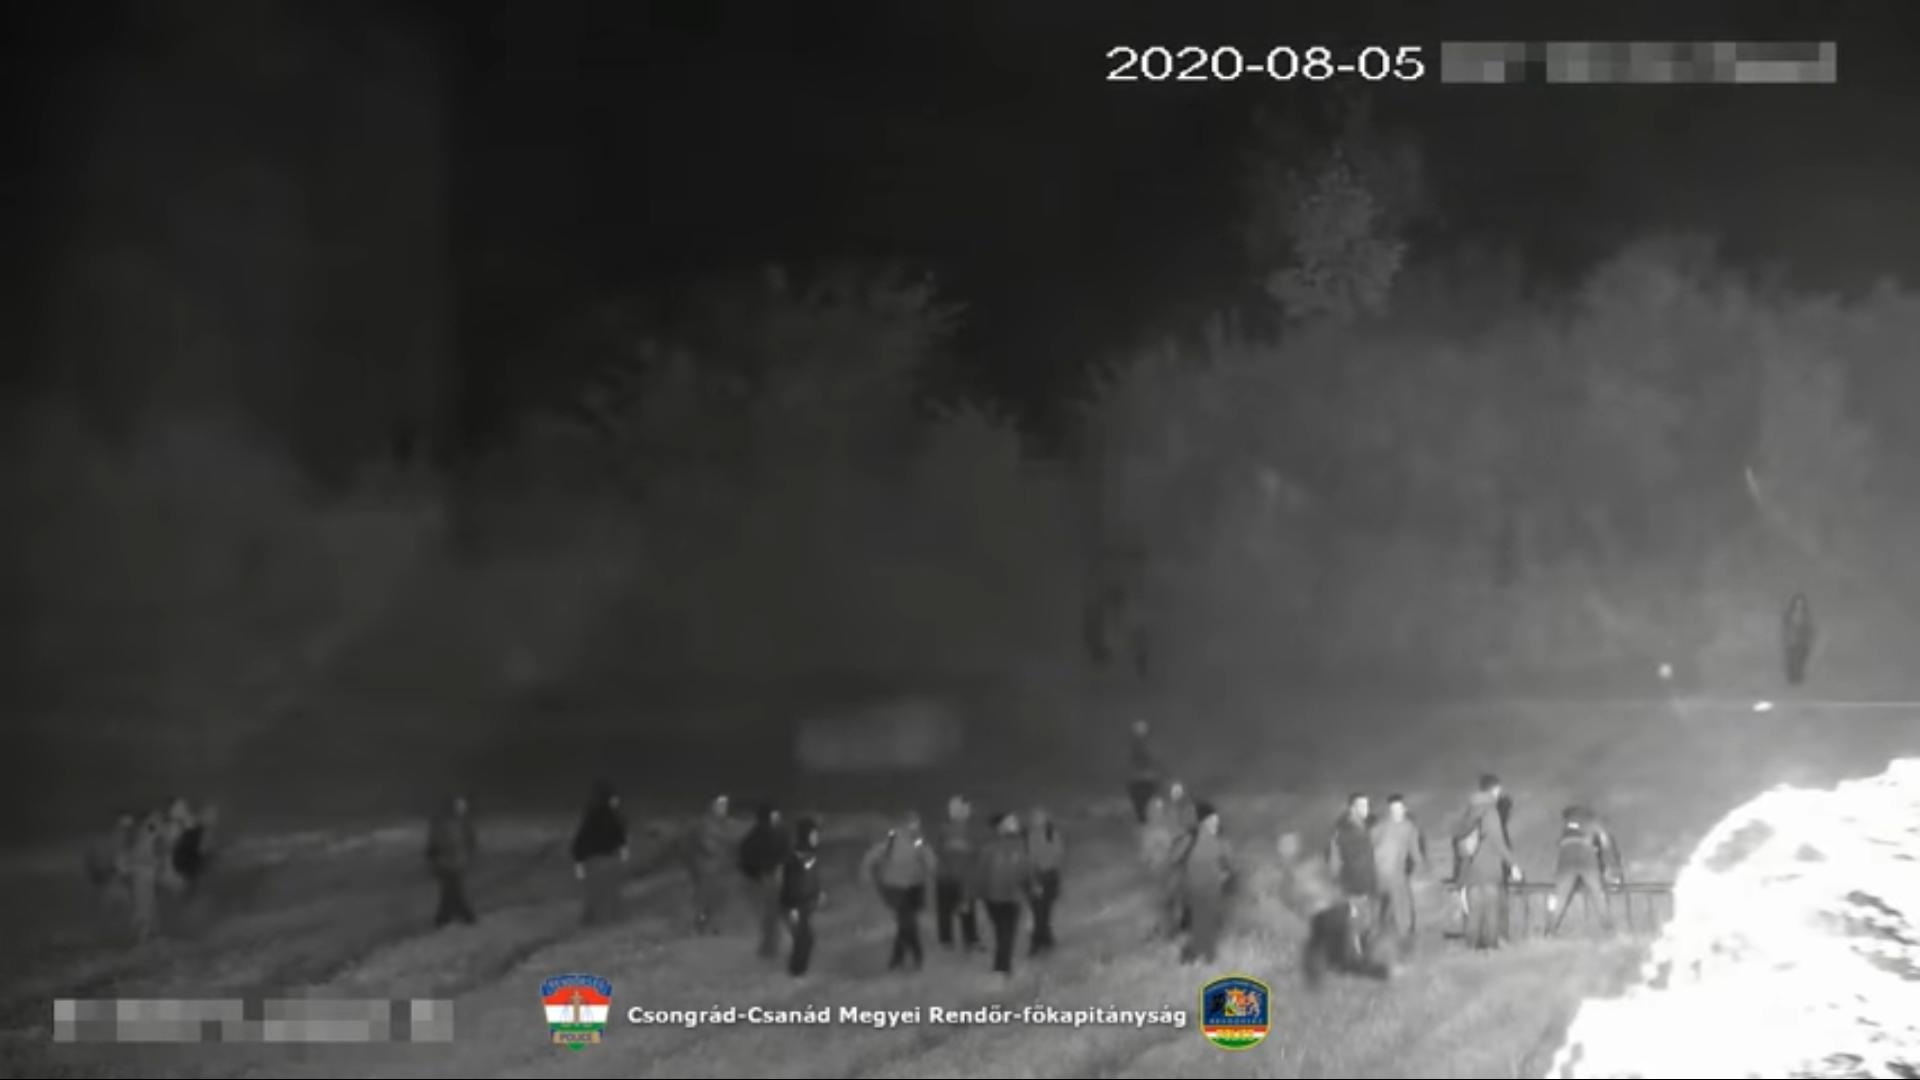 Migrants Attempt to Break Through Röszke Border Crossing